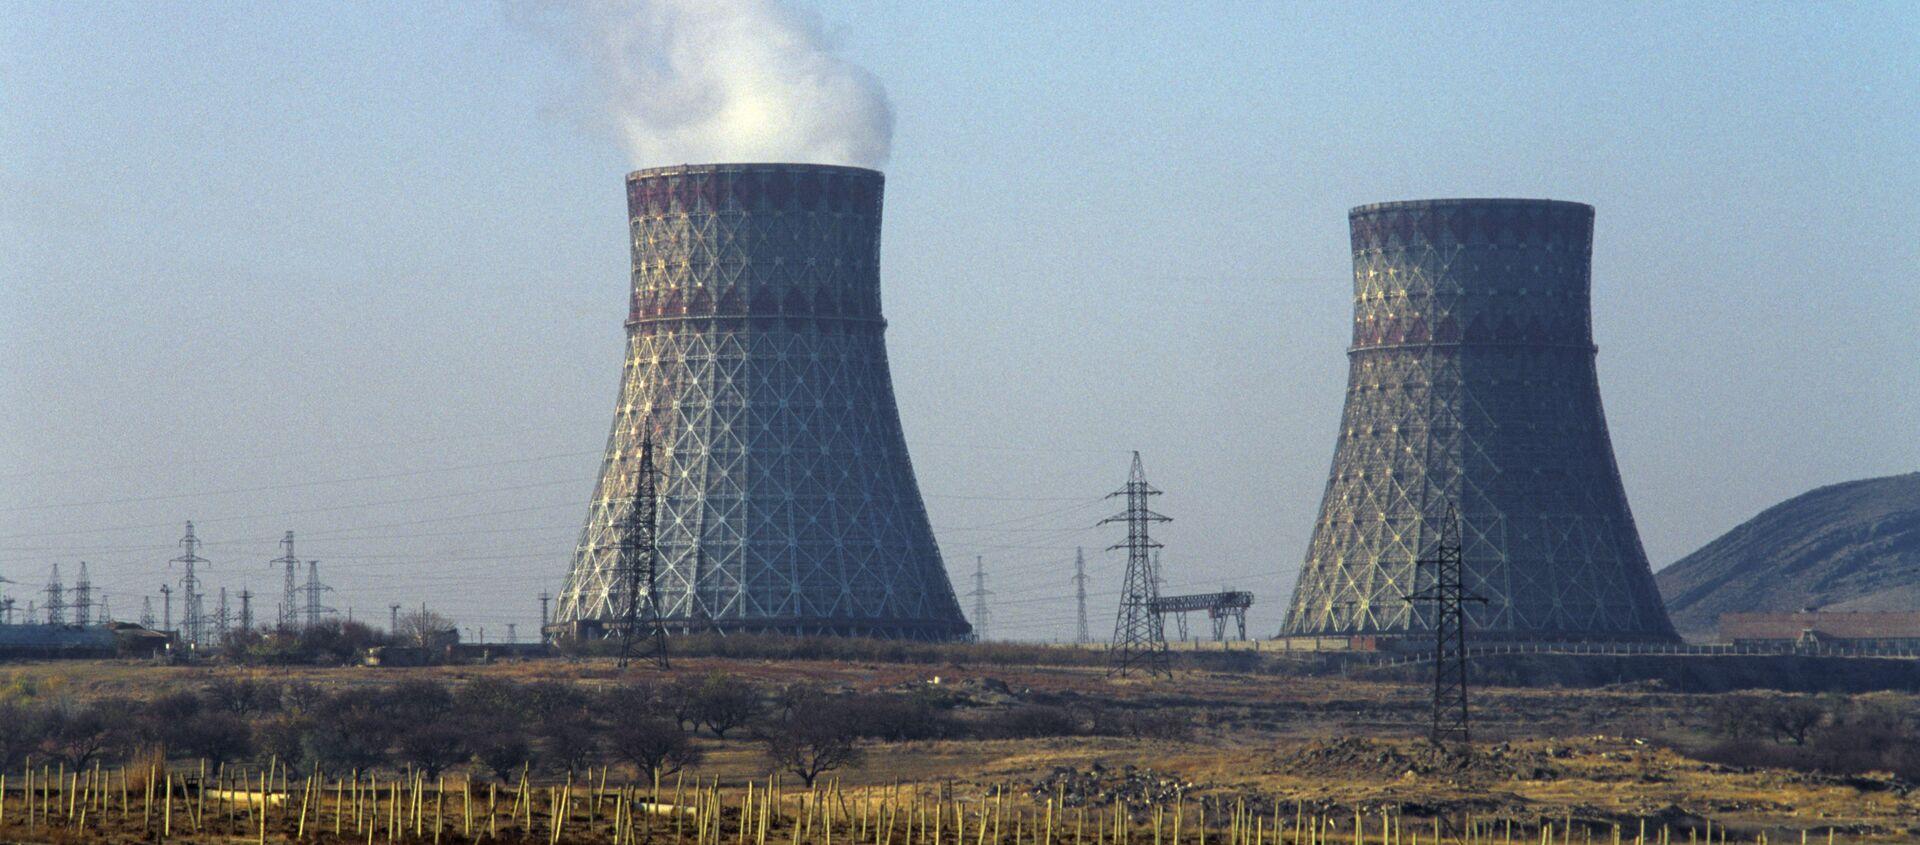 Армянская АЭС - Sputnik Азербайджан, 1920, 05.03.2018